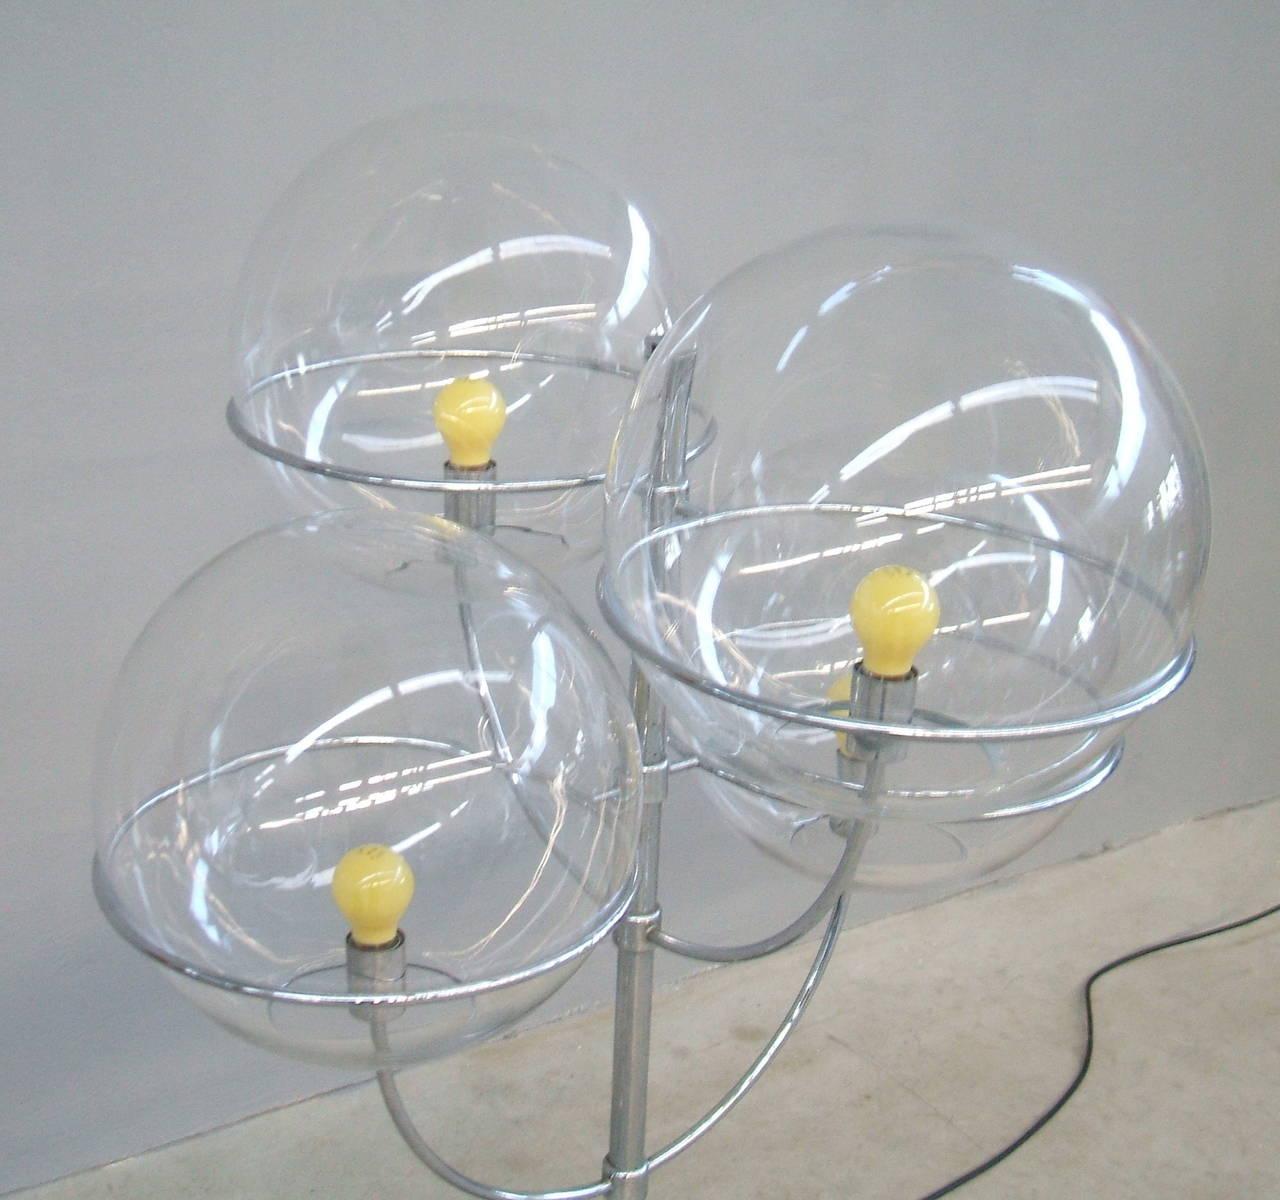 Mid-Century Modern Lyndon De Sol Floor Lamp by Vico Magistretti For Sale